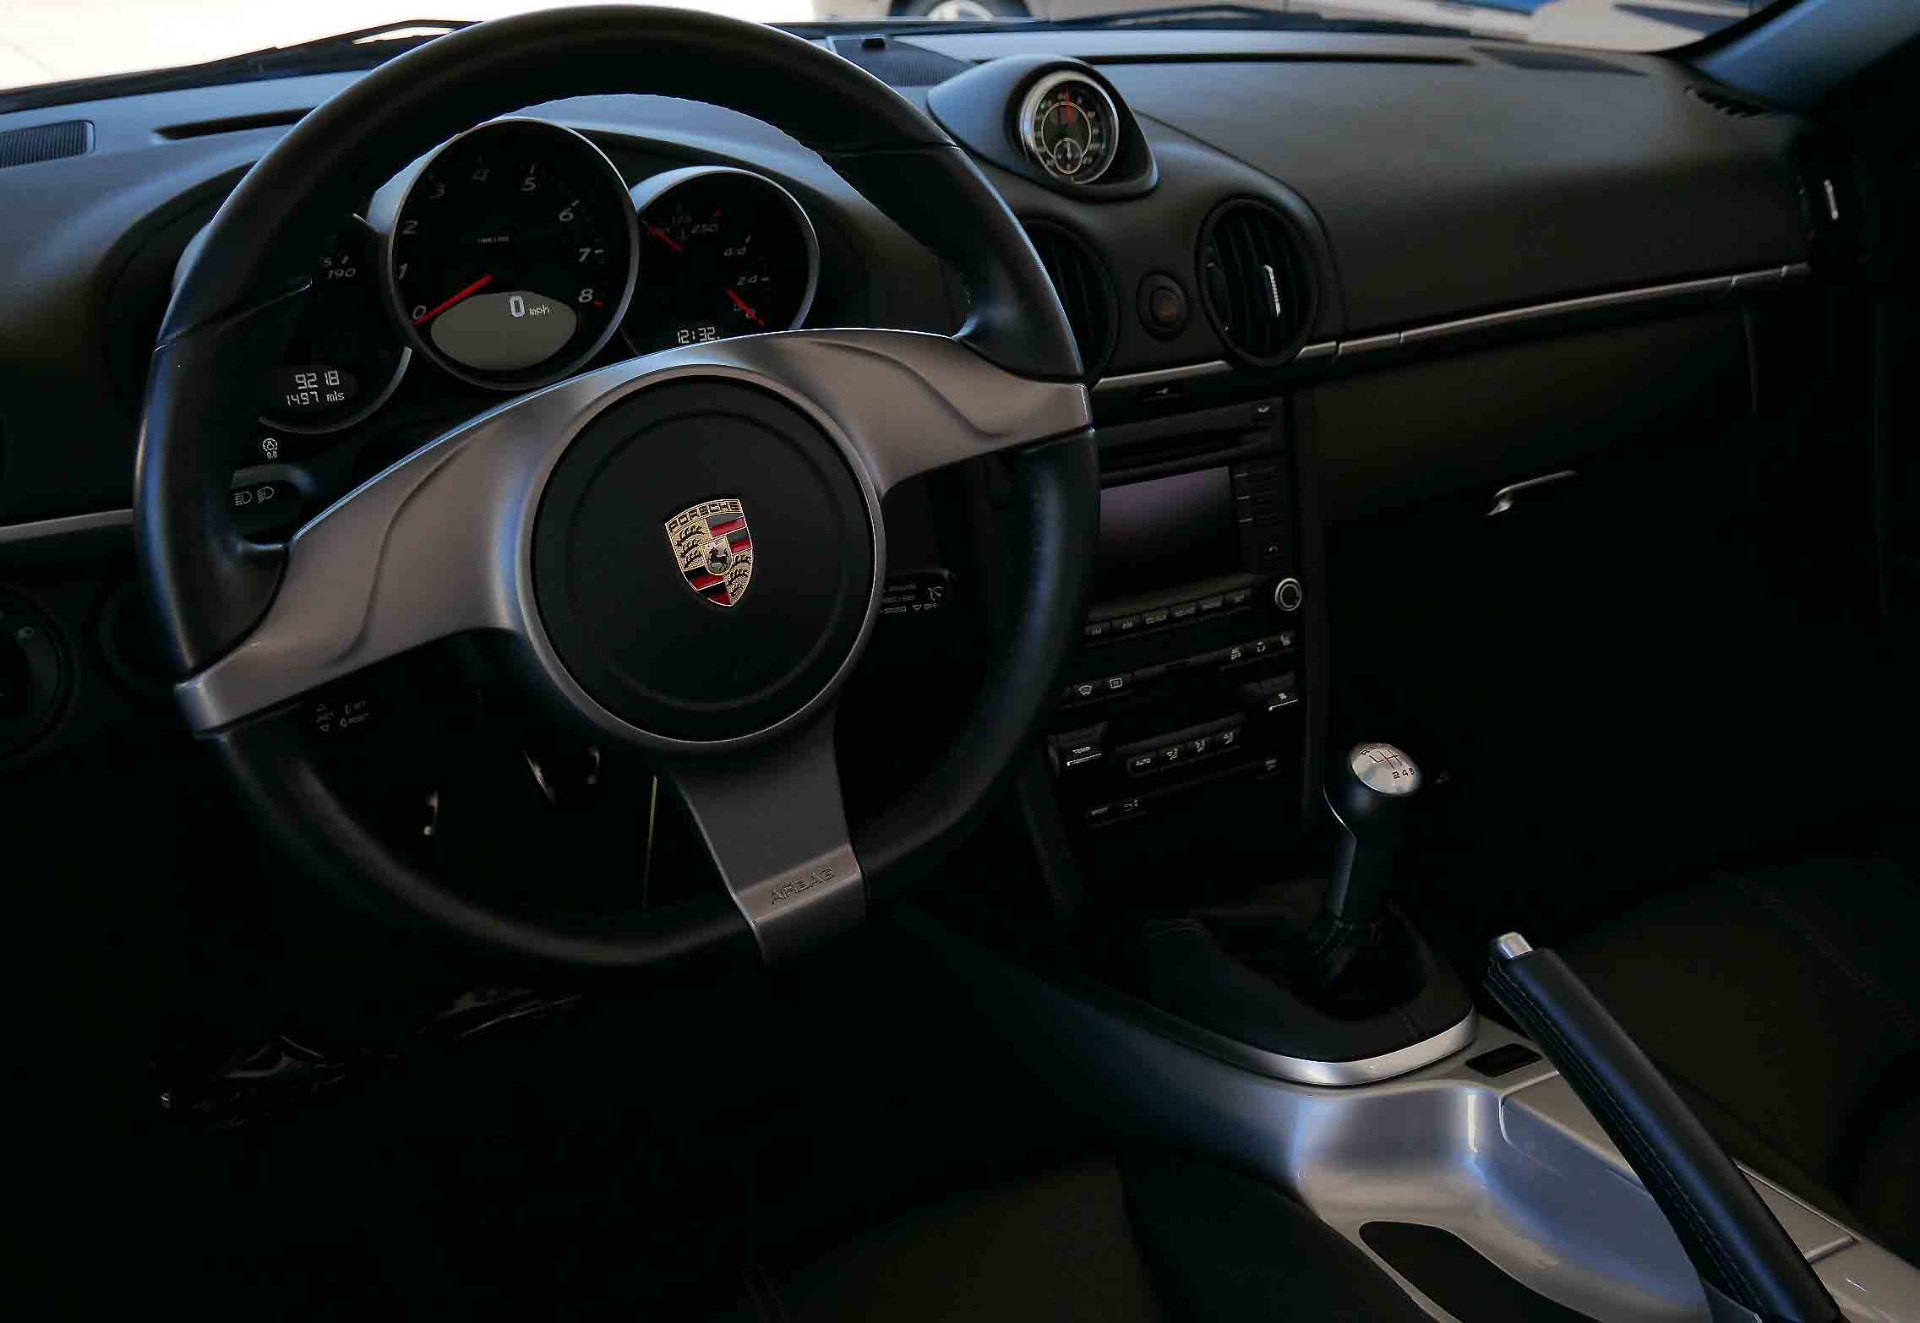 Used 2011 Porsche Boxster Spyder Marietta Ga